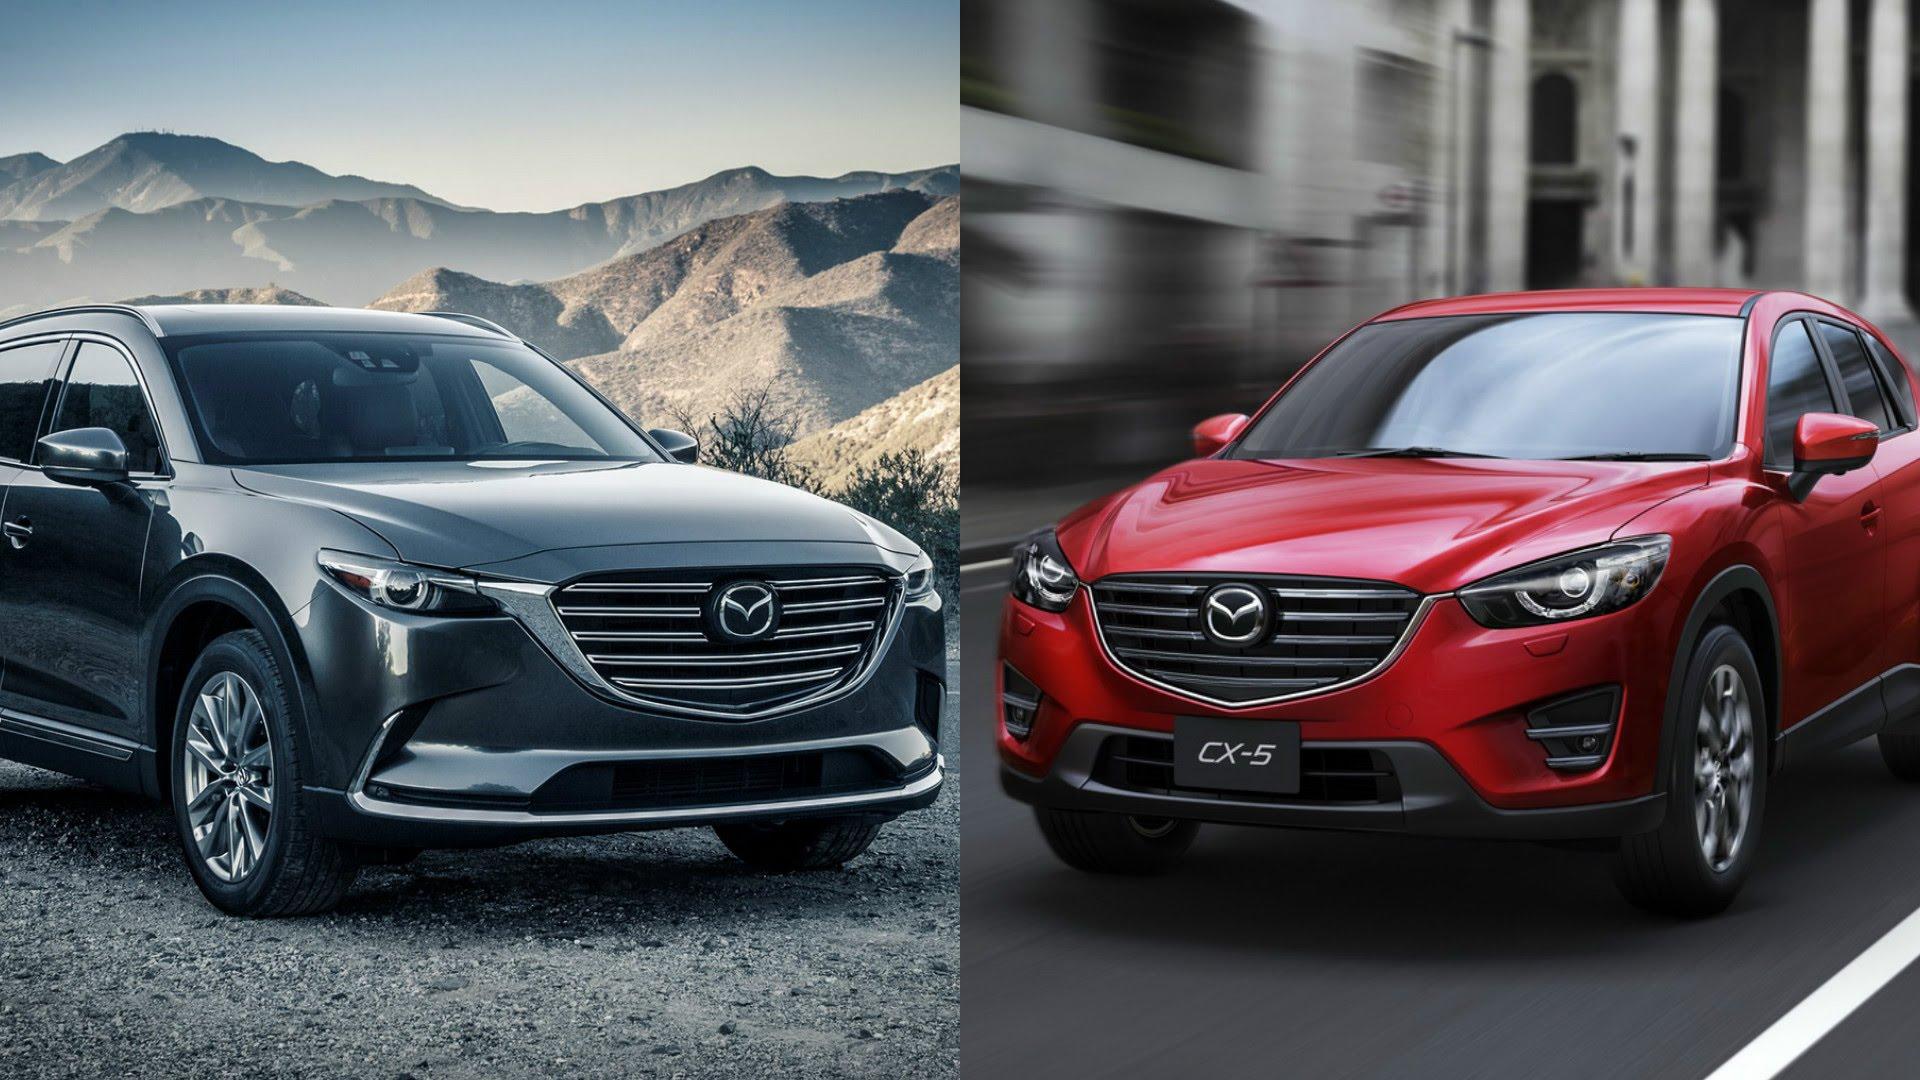 مقارنة بين مازدا CX-9 2017 و 2016